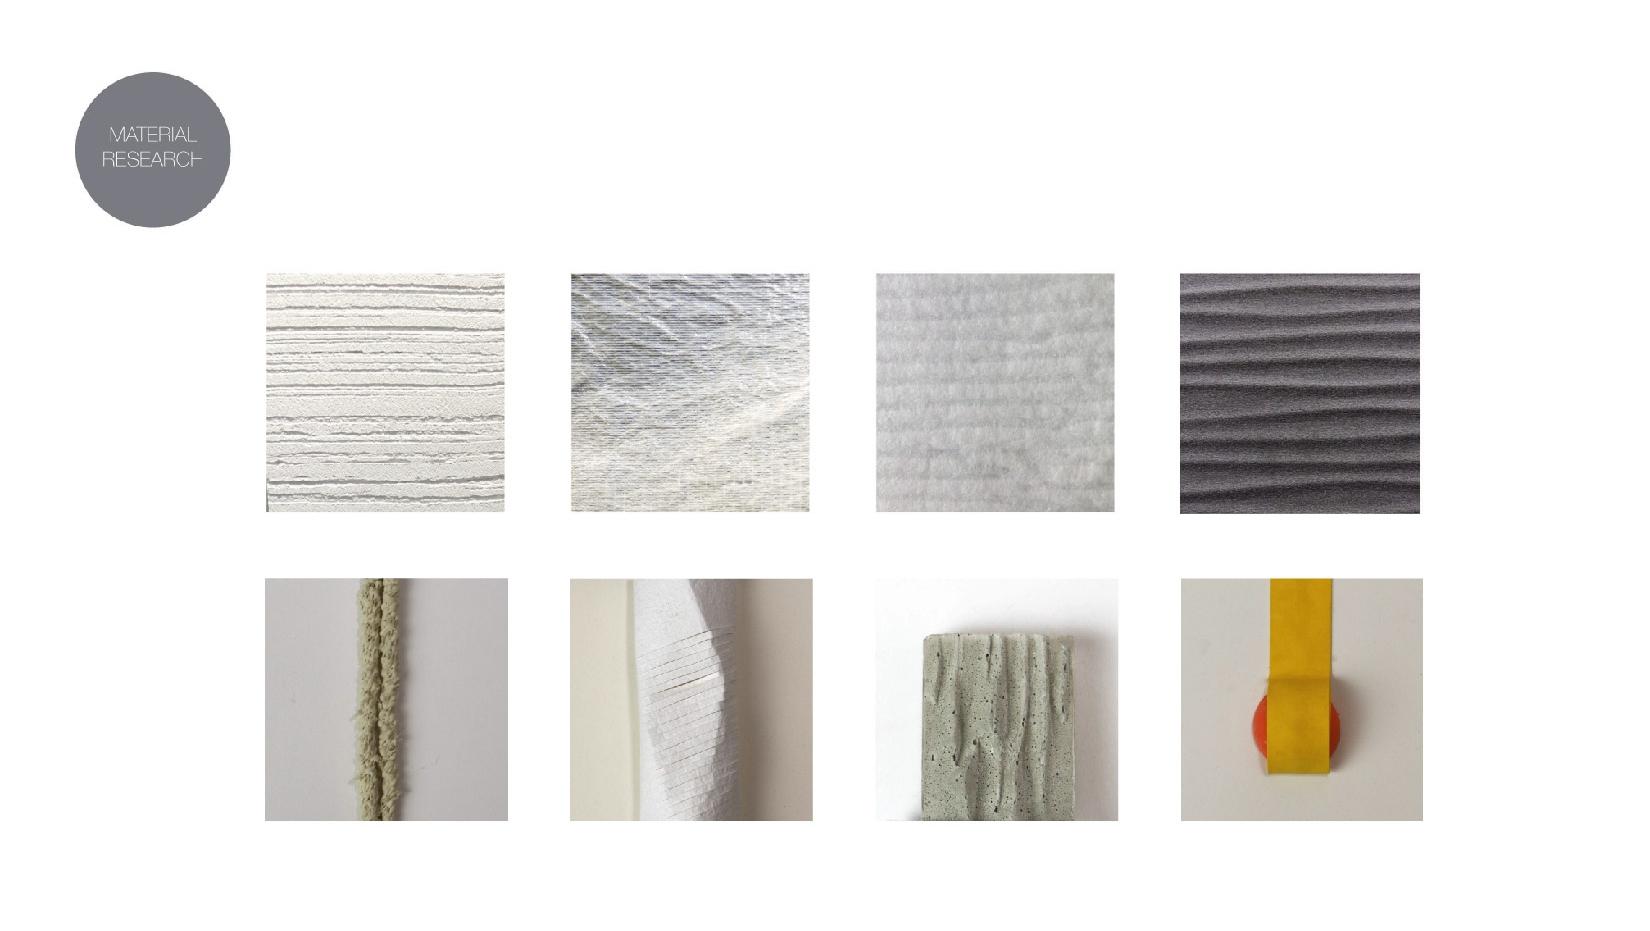 bag design process by Jay Qian